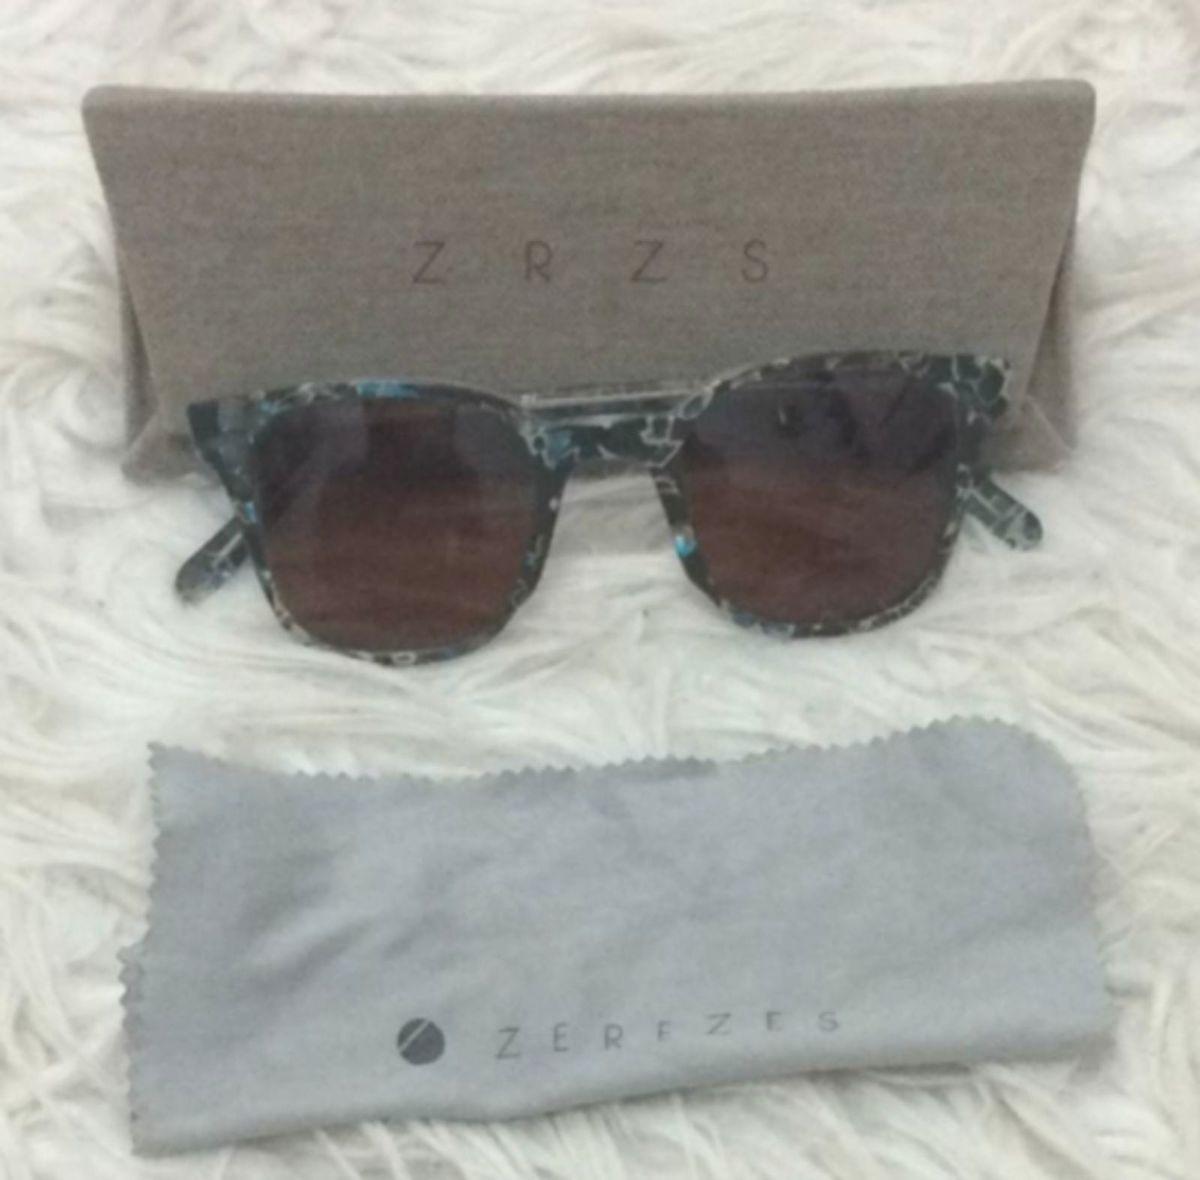 bd0dd2a1ad0ce óculos de sol zerezes - óculos zerezes.  Czm6ly9wag90b3muzw5qb2vplmnvbs5ici9wcm9kdwn0cy8xmtaynzqvotzlnwy3mtnkowqyyzlmmgflntdjzgrjowq5mwq0nwiuanbn  ...